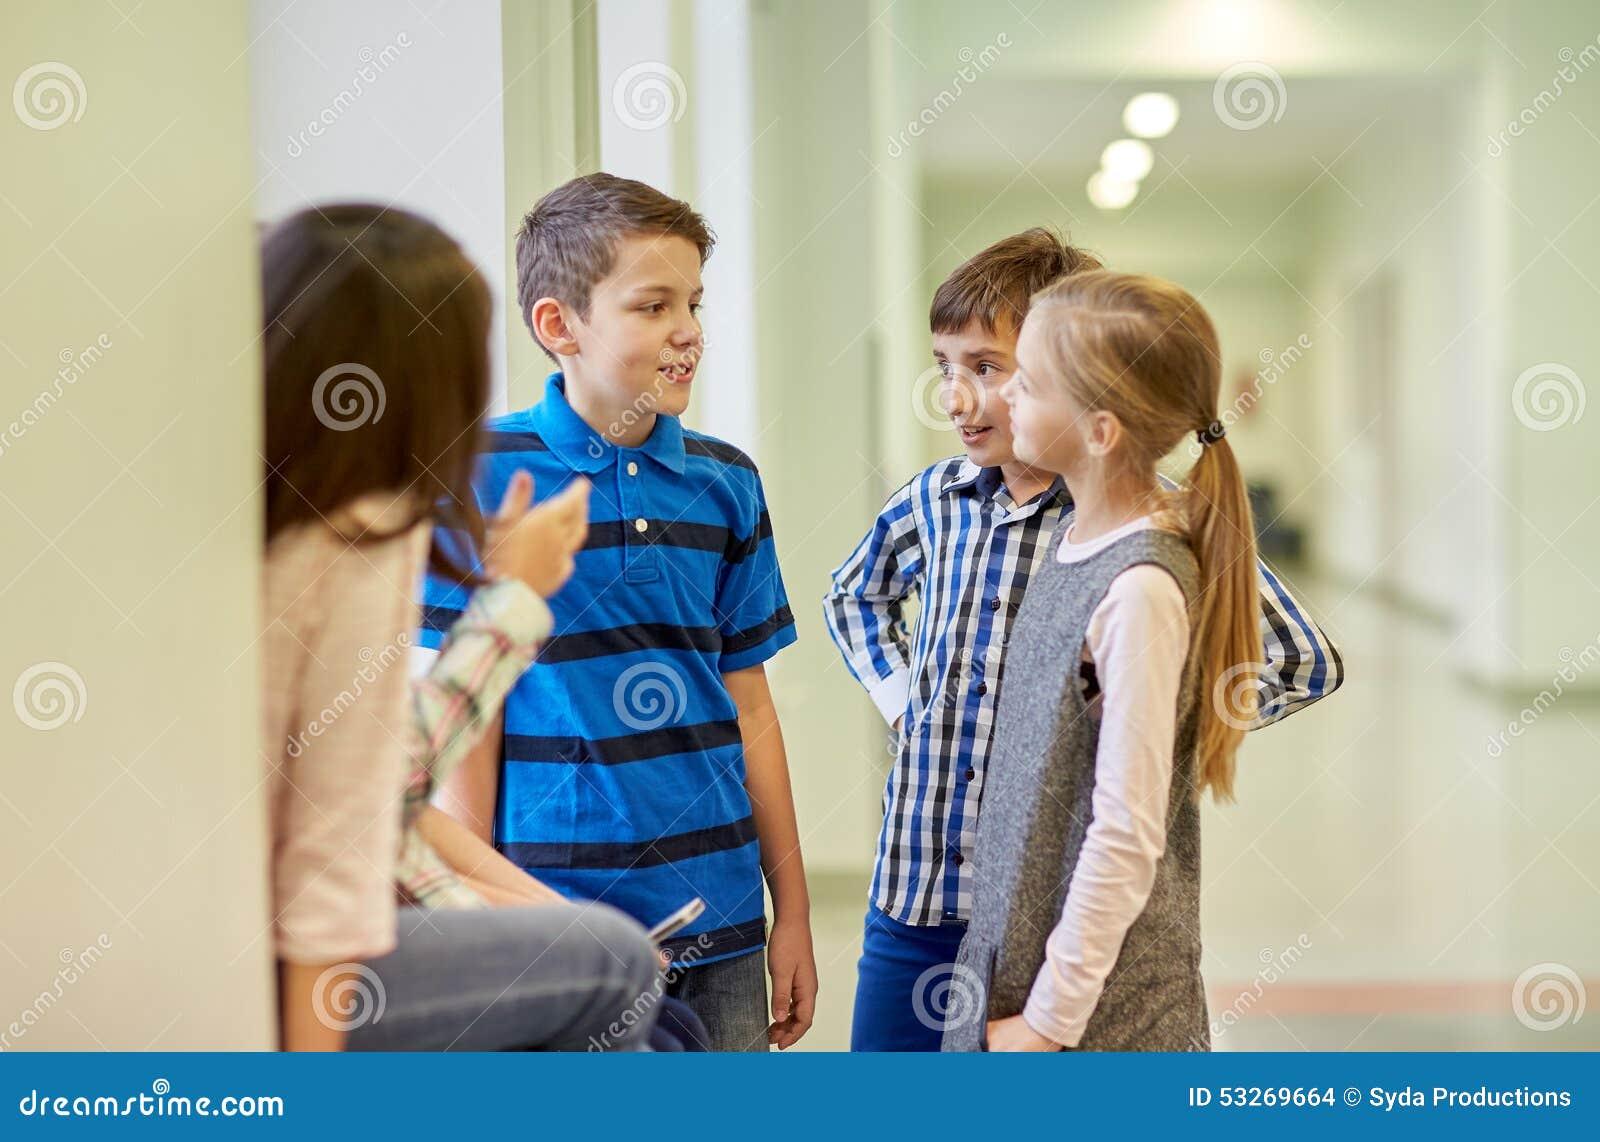 Group Of Smiling School Kids Talking In Corridor Stock ...